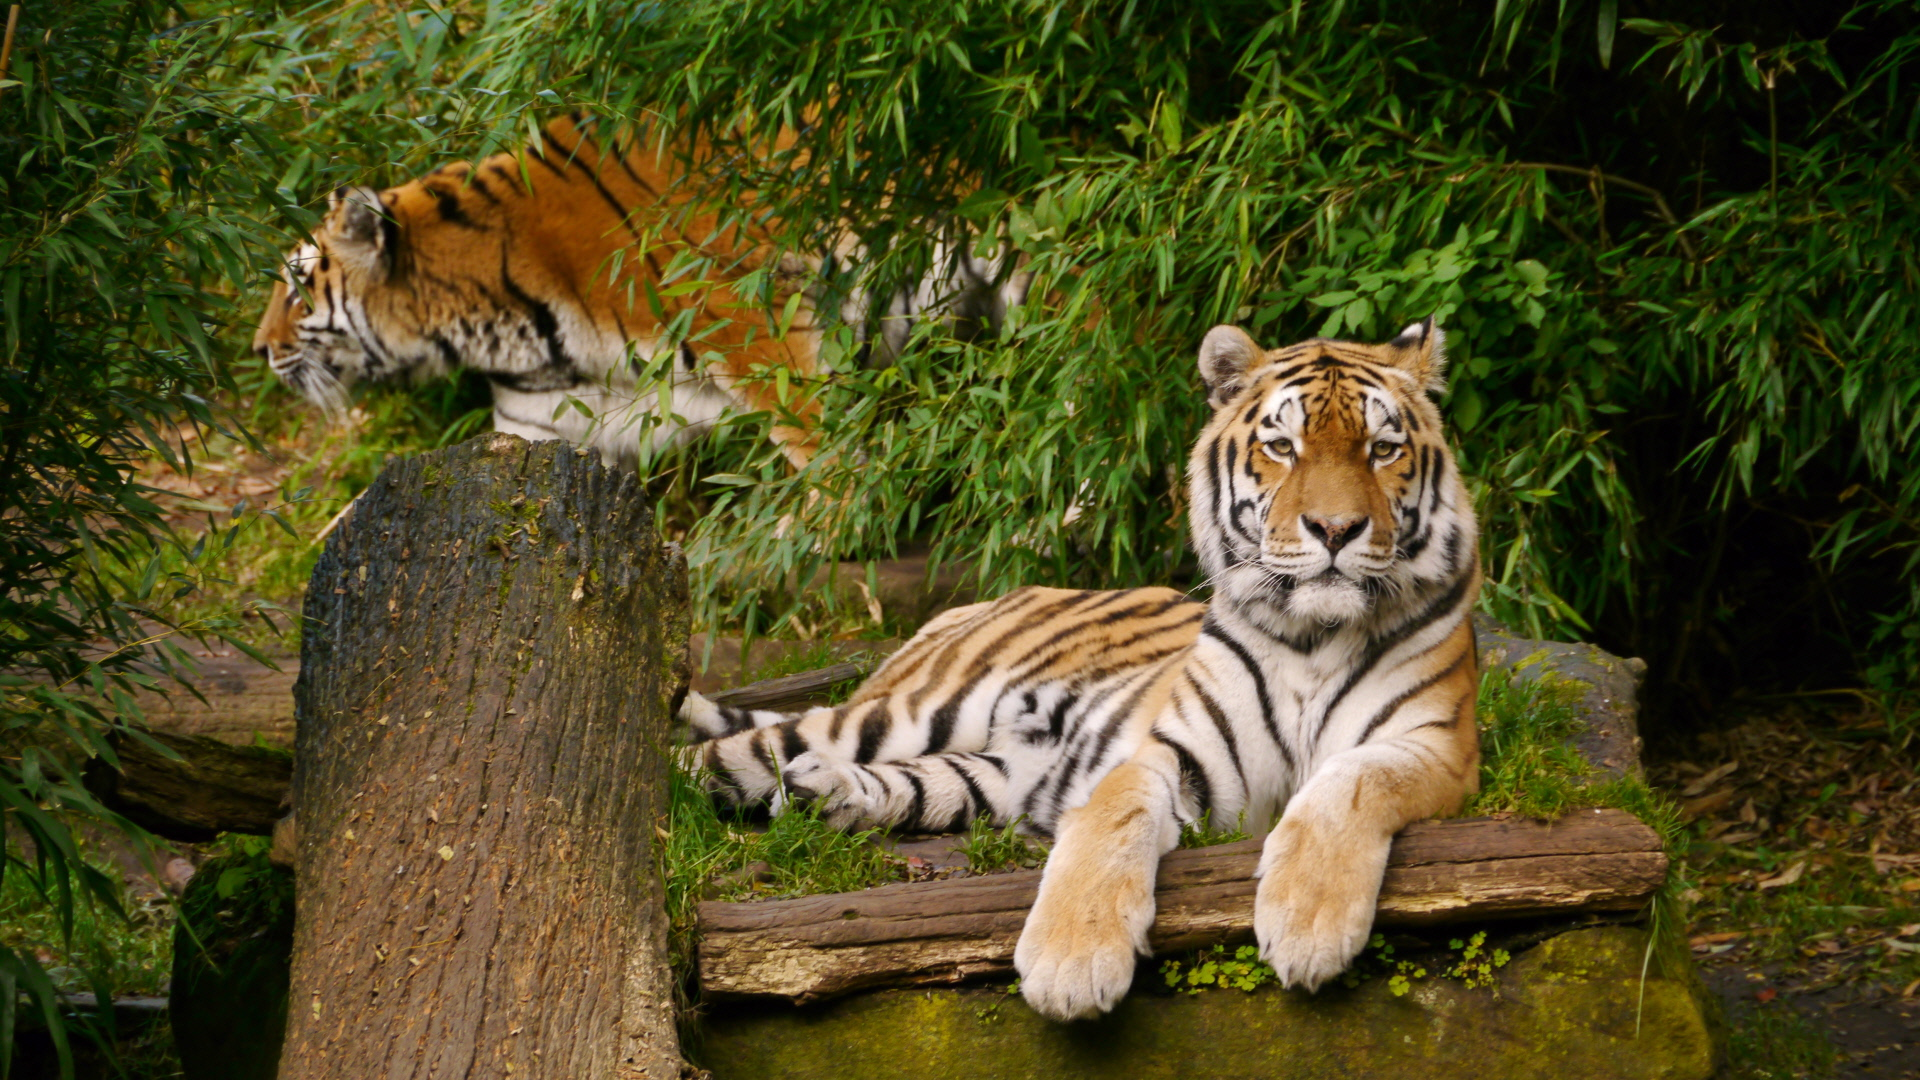 animals_20151113_1427054462